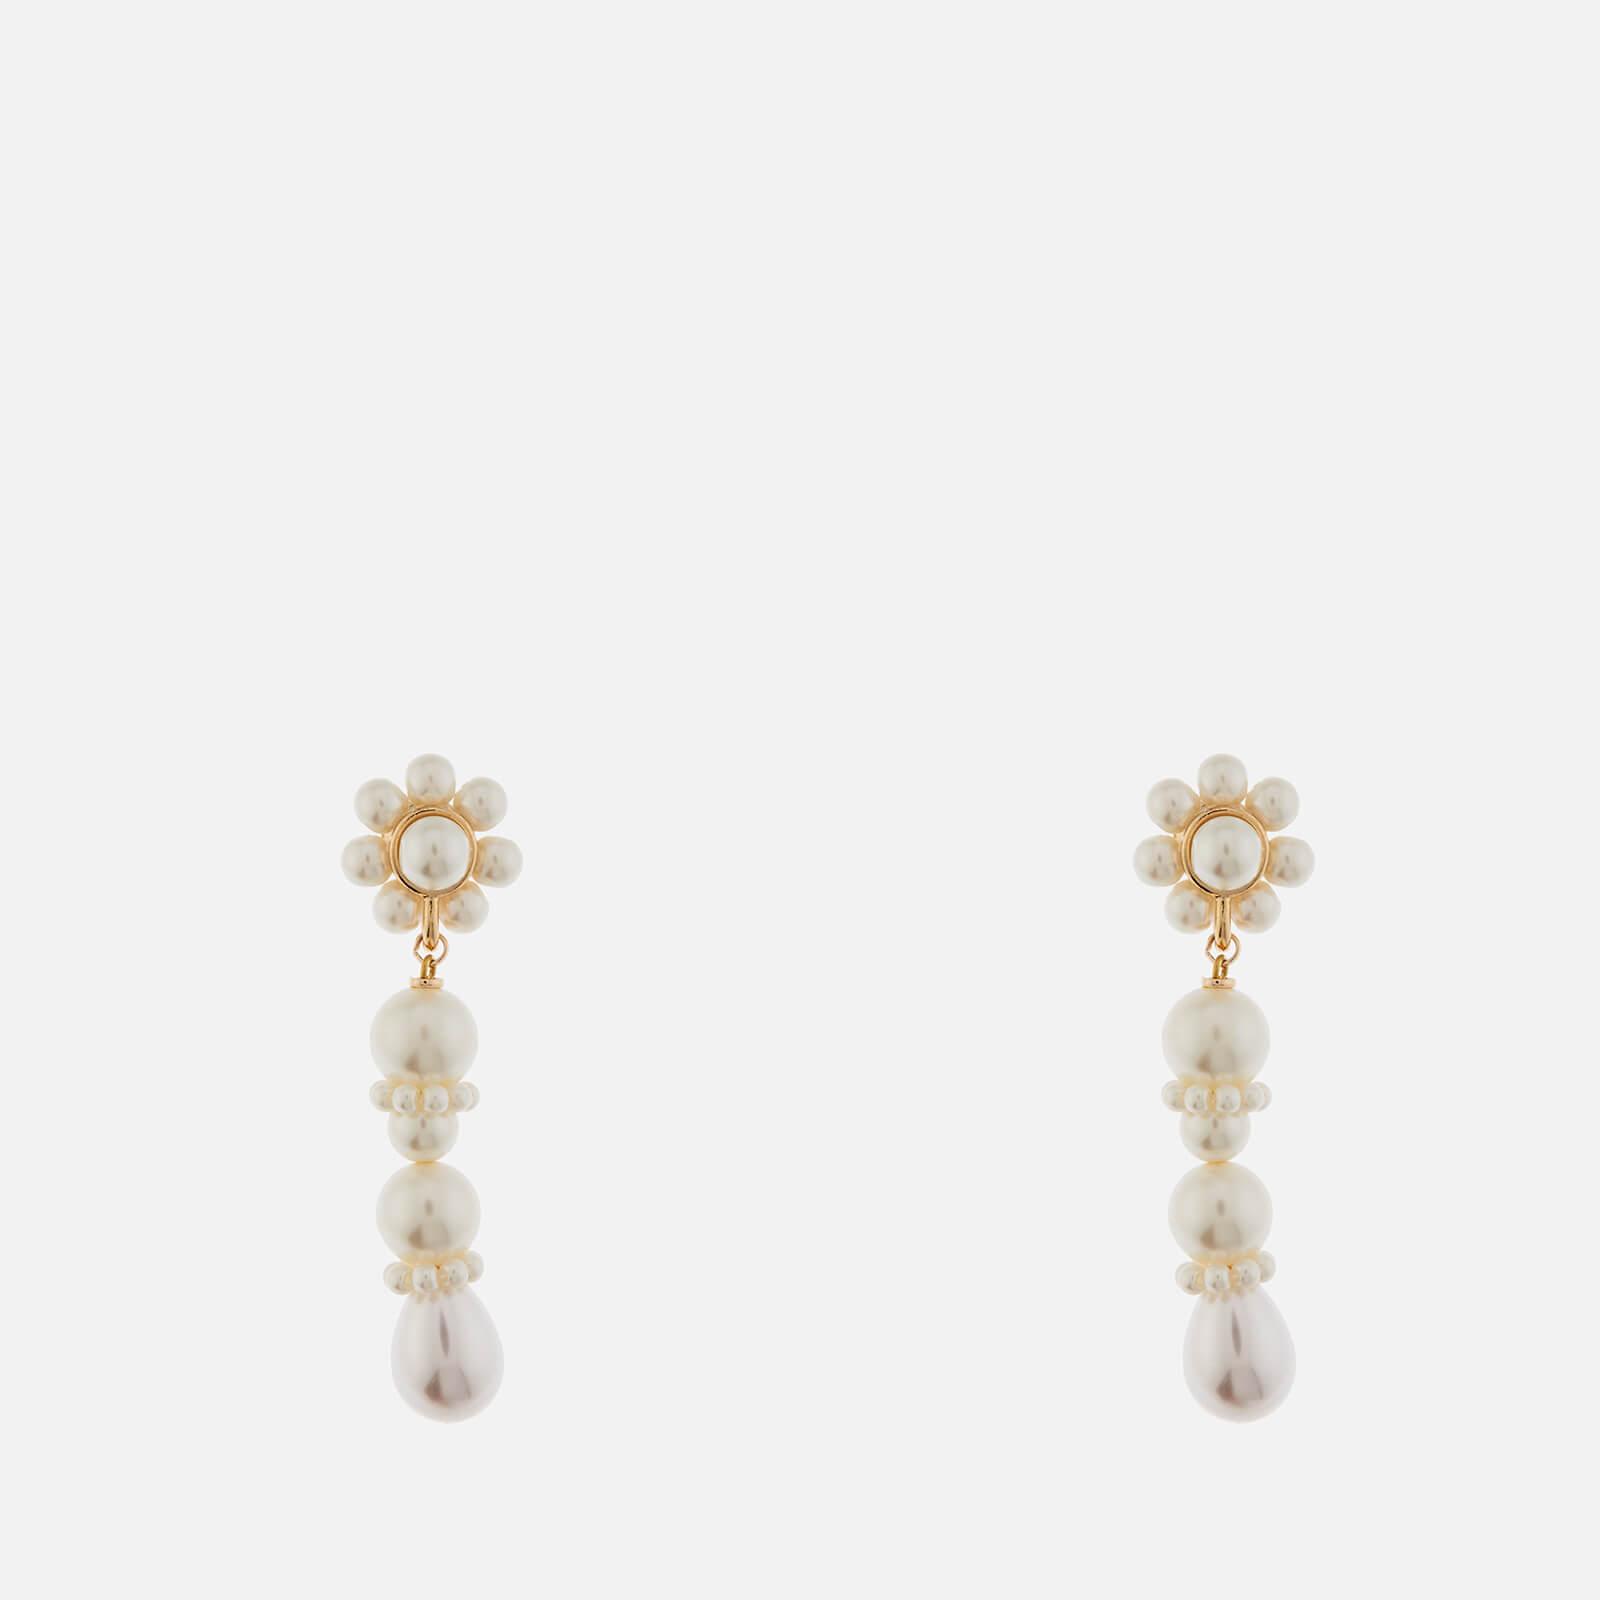 Shrimps Women's Florian Drop Earrings - Cream